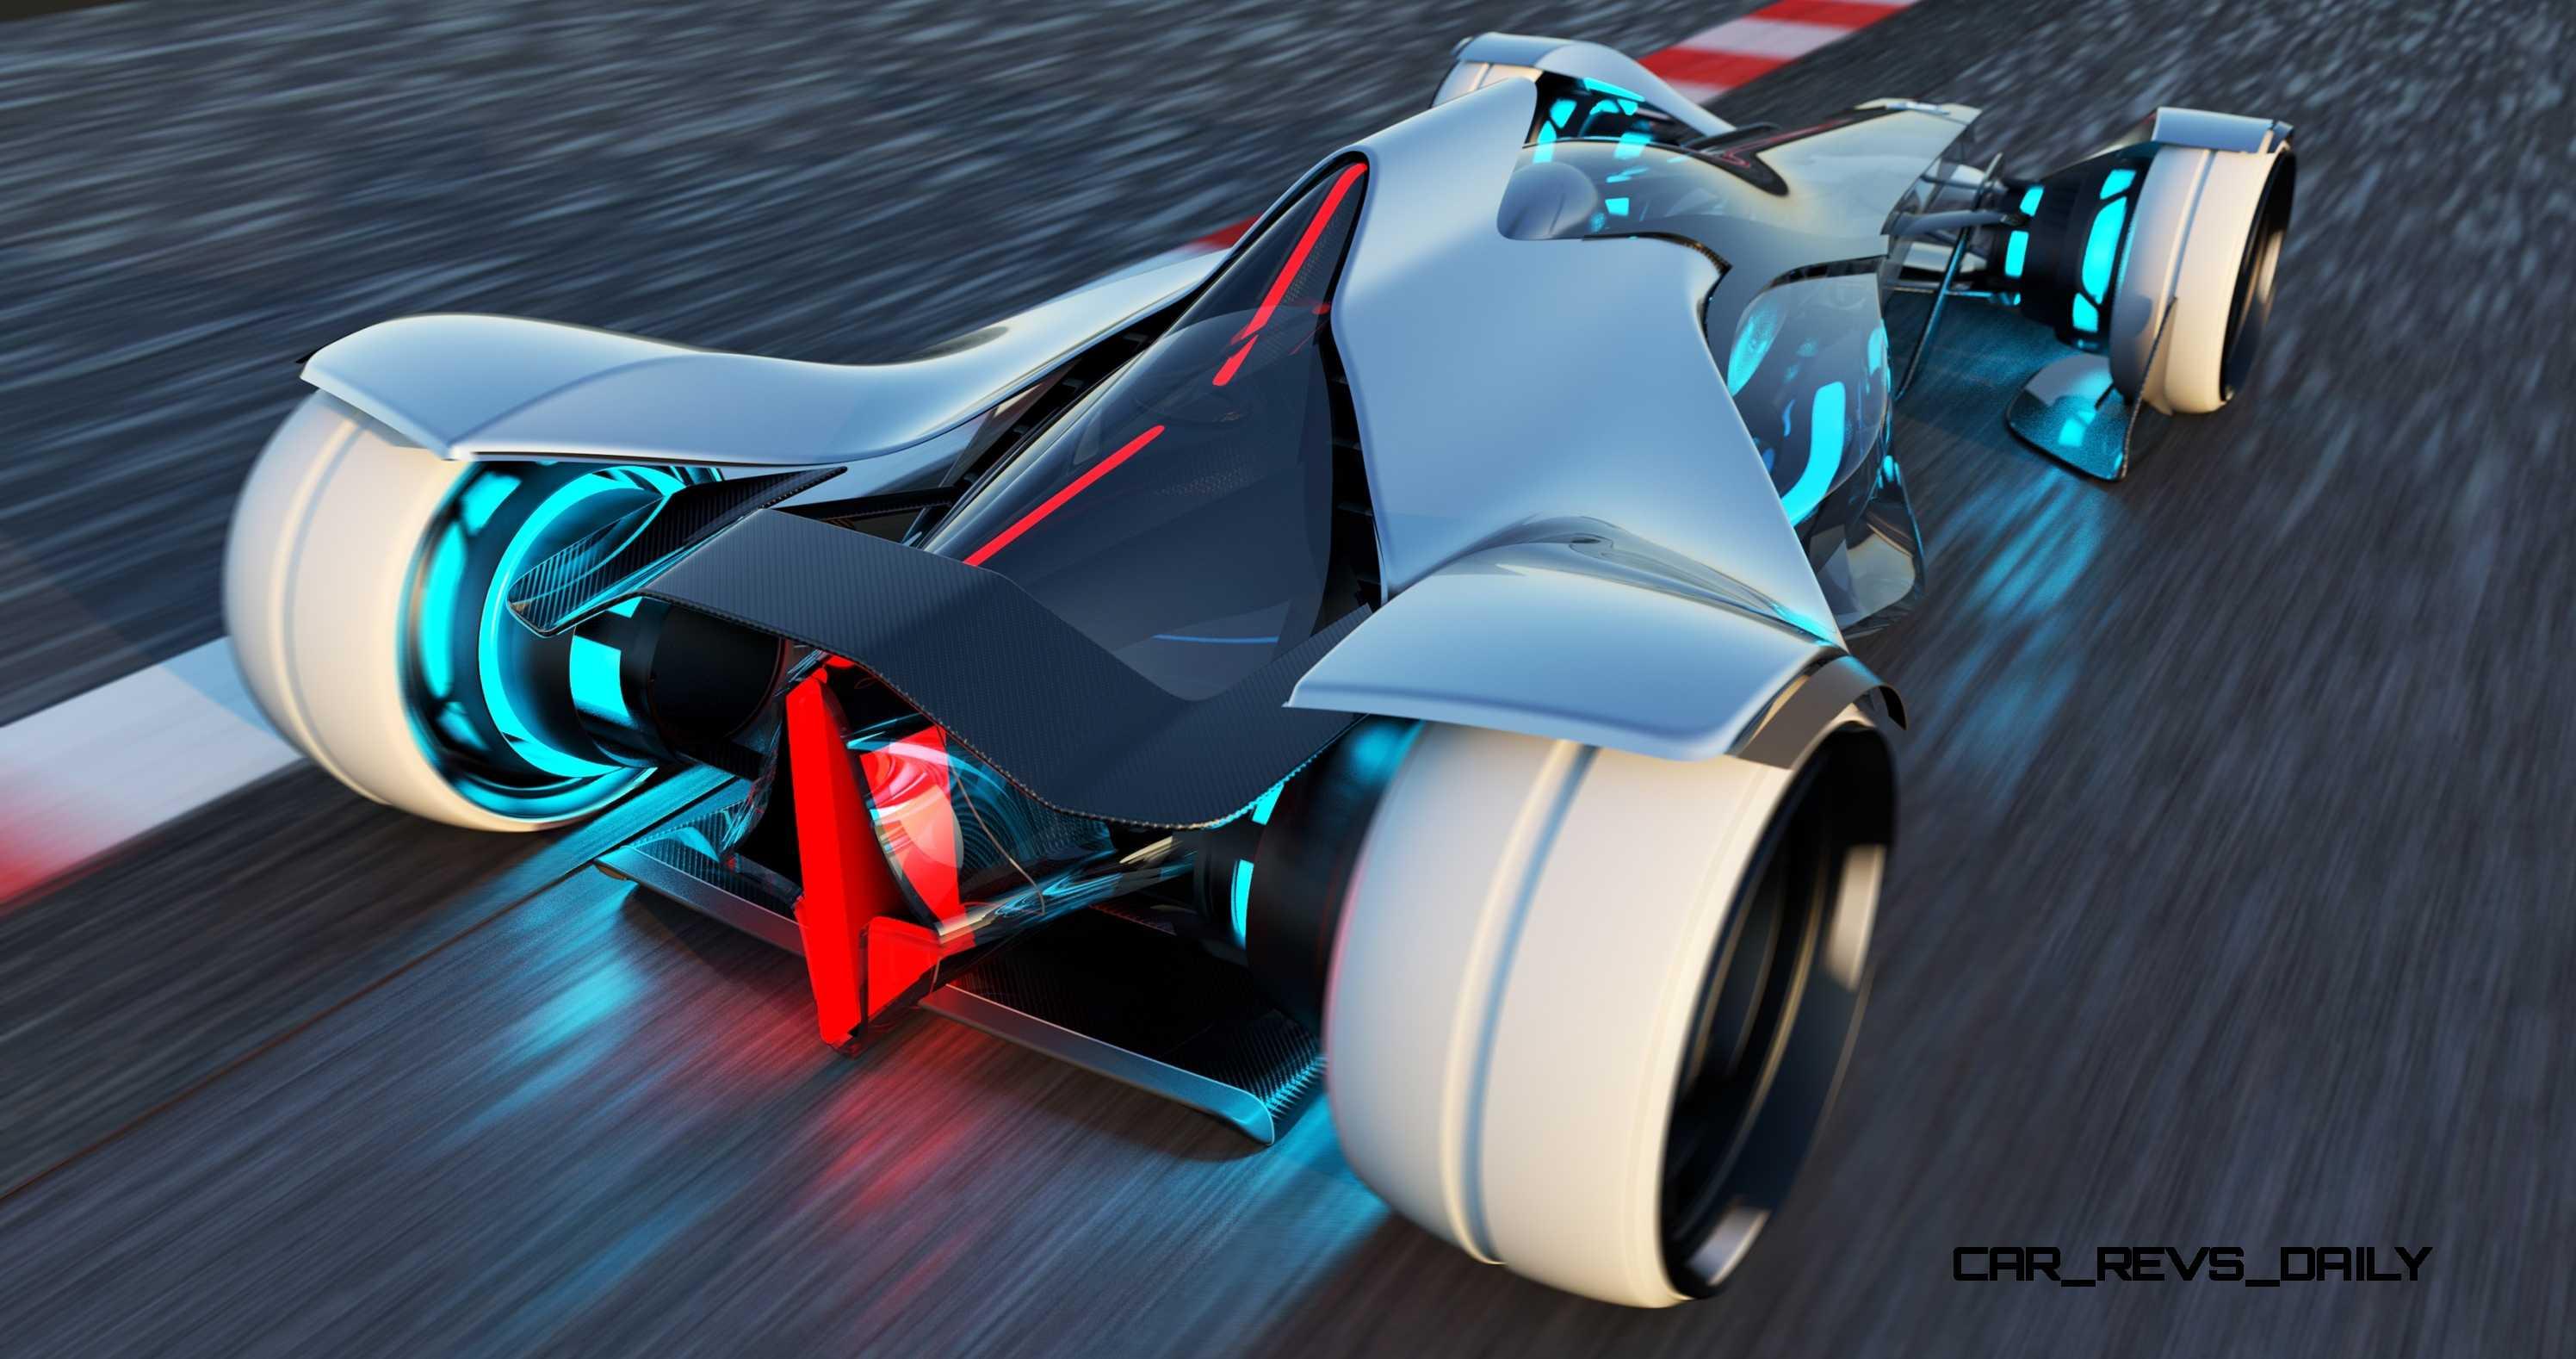 2029 Infiniti SYNAPTIQ Cool Street Racing Cars